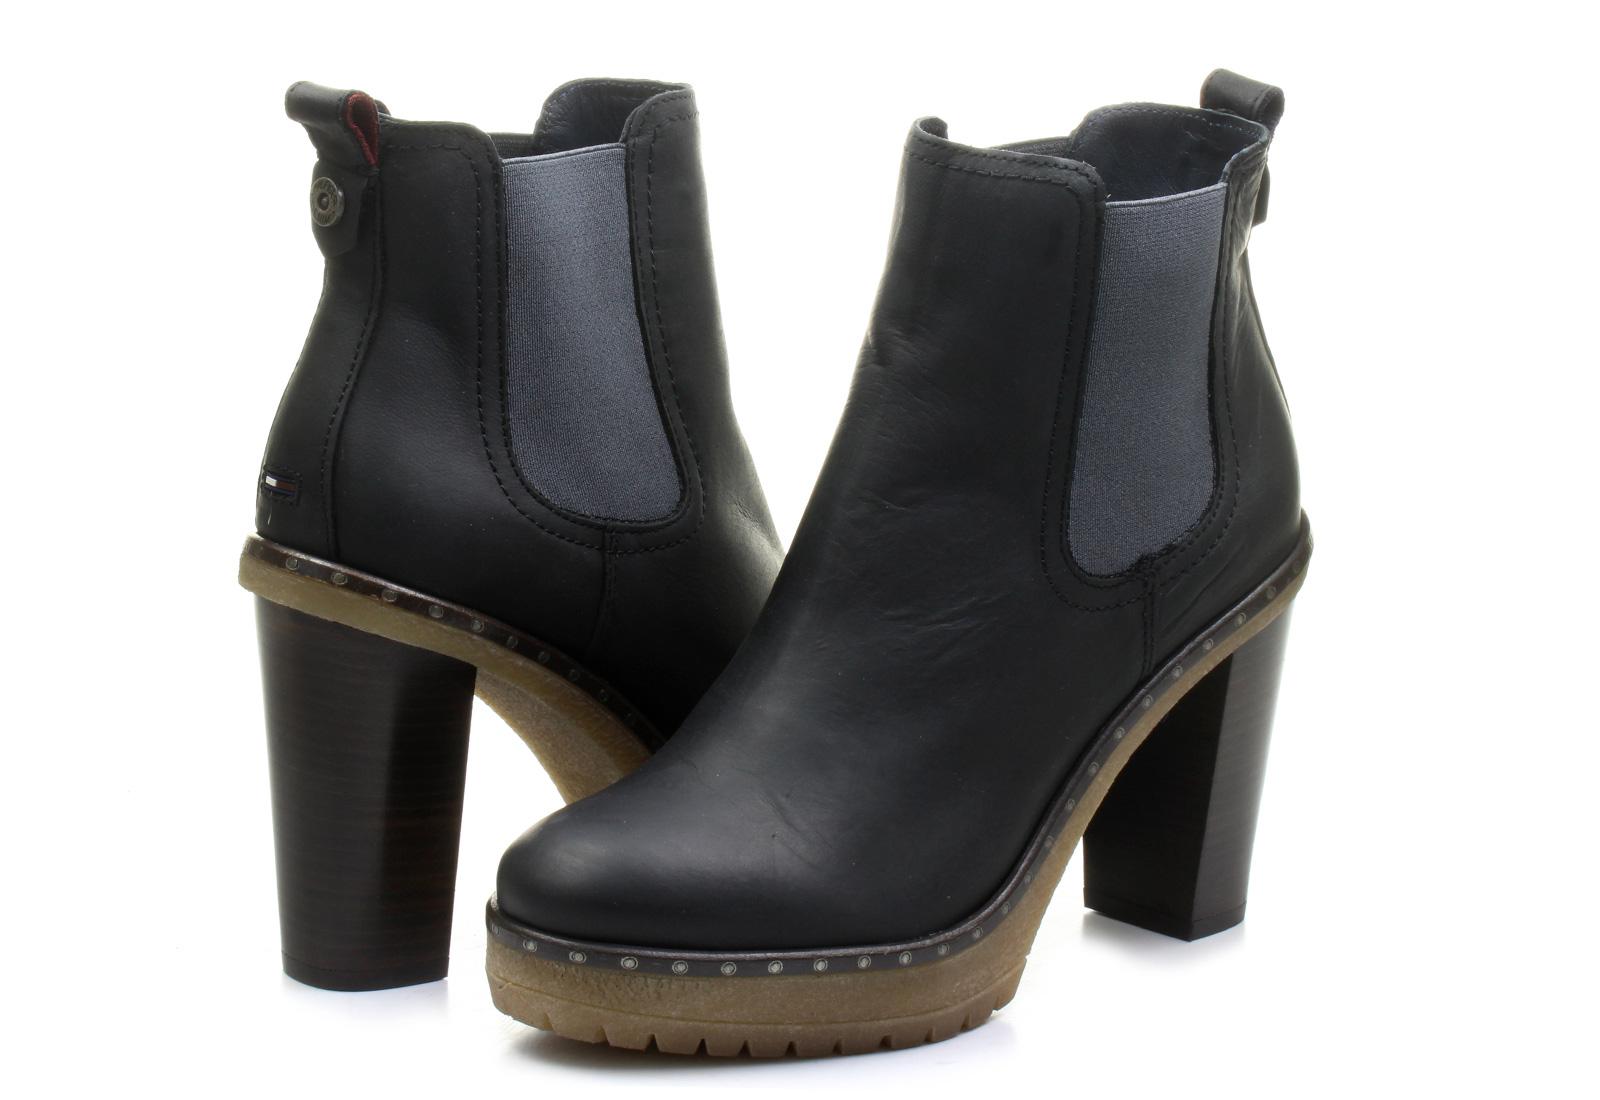 a9170a0b15 Tommy Hilfiger Csizma - Cleo 1a - 15F-9813-990 - Office Shoes ...